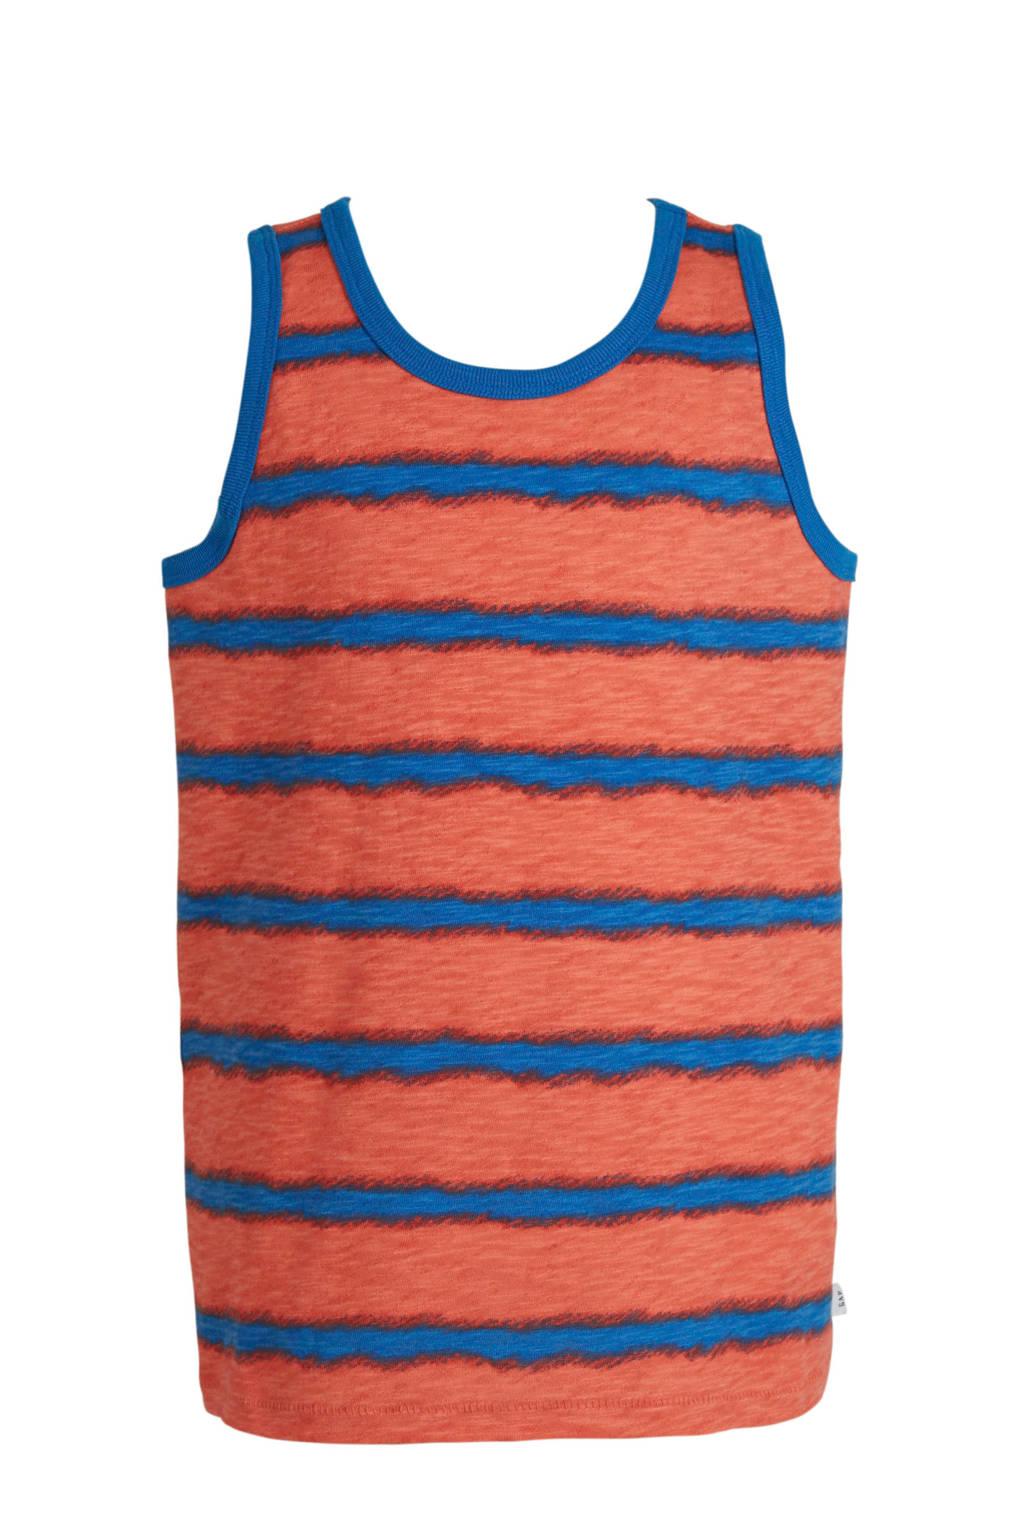 GAP gestreepte singlet oranje/blauw, Oranje/blauw